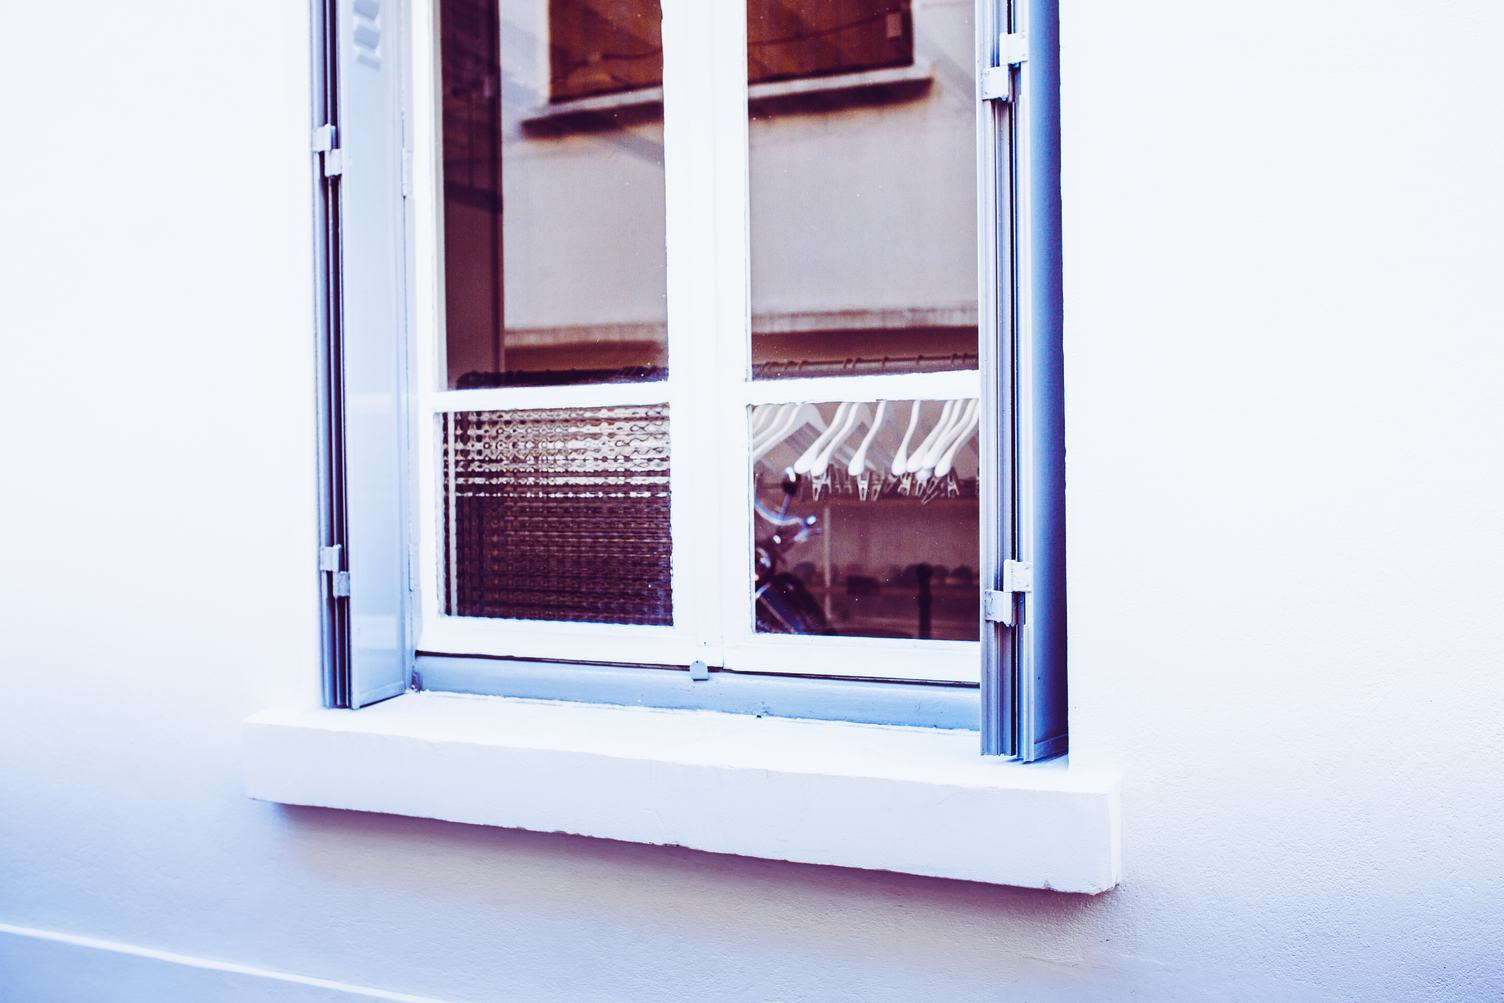 Wall with a Reflecting Wardrobe Window